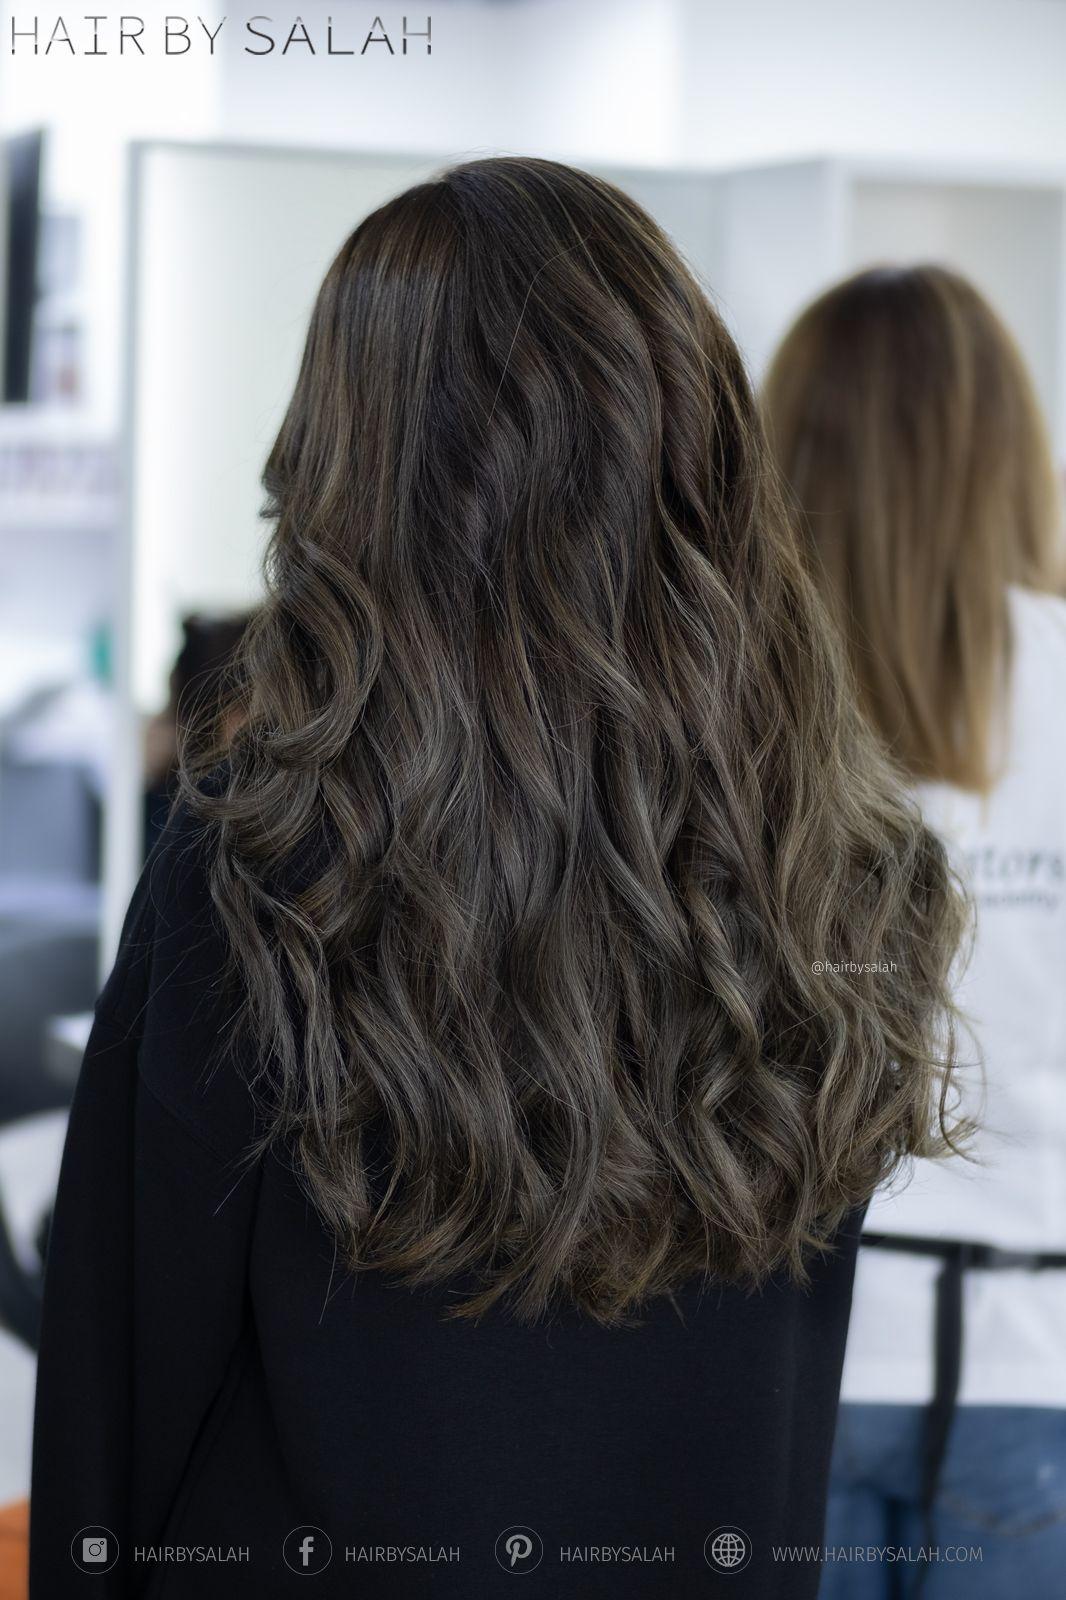 Pin on Latest Hair Color Ideas by Salah